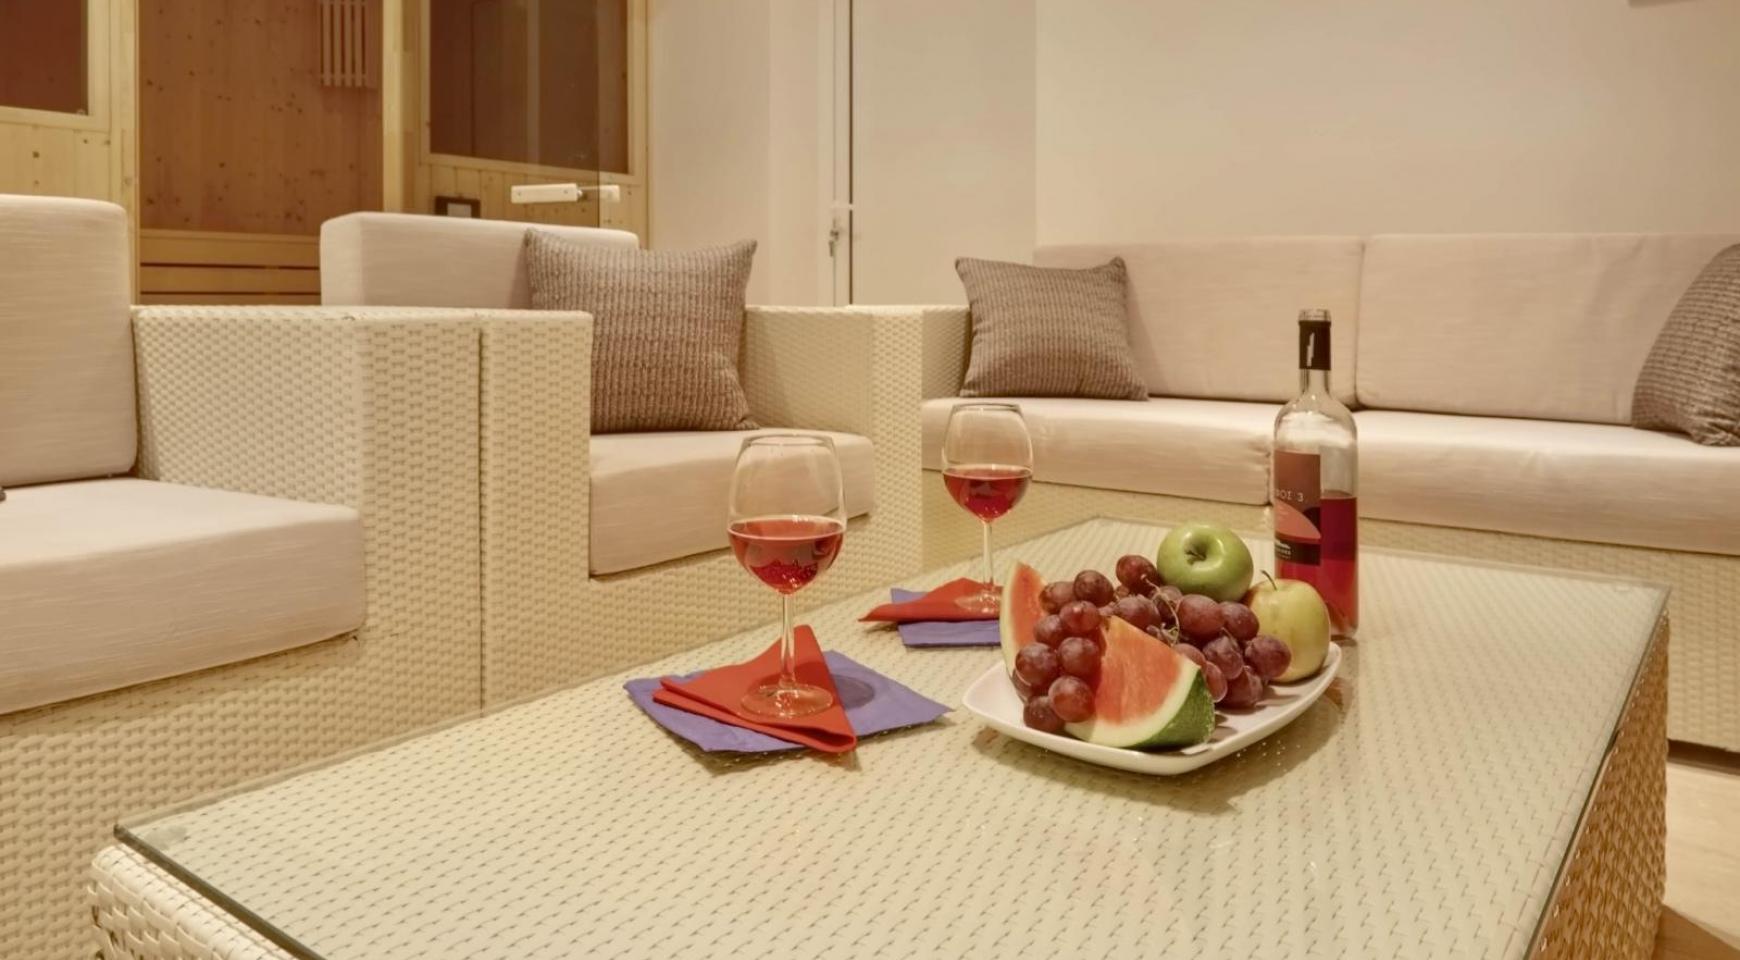 New Luxurious 4 Bedroom Villa in the Tourist Area - 40